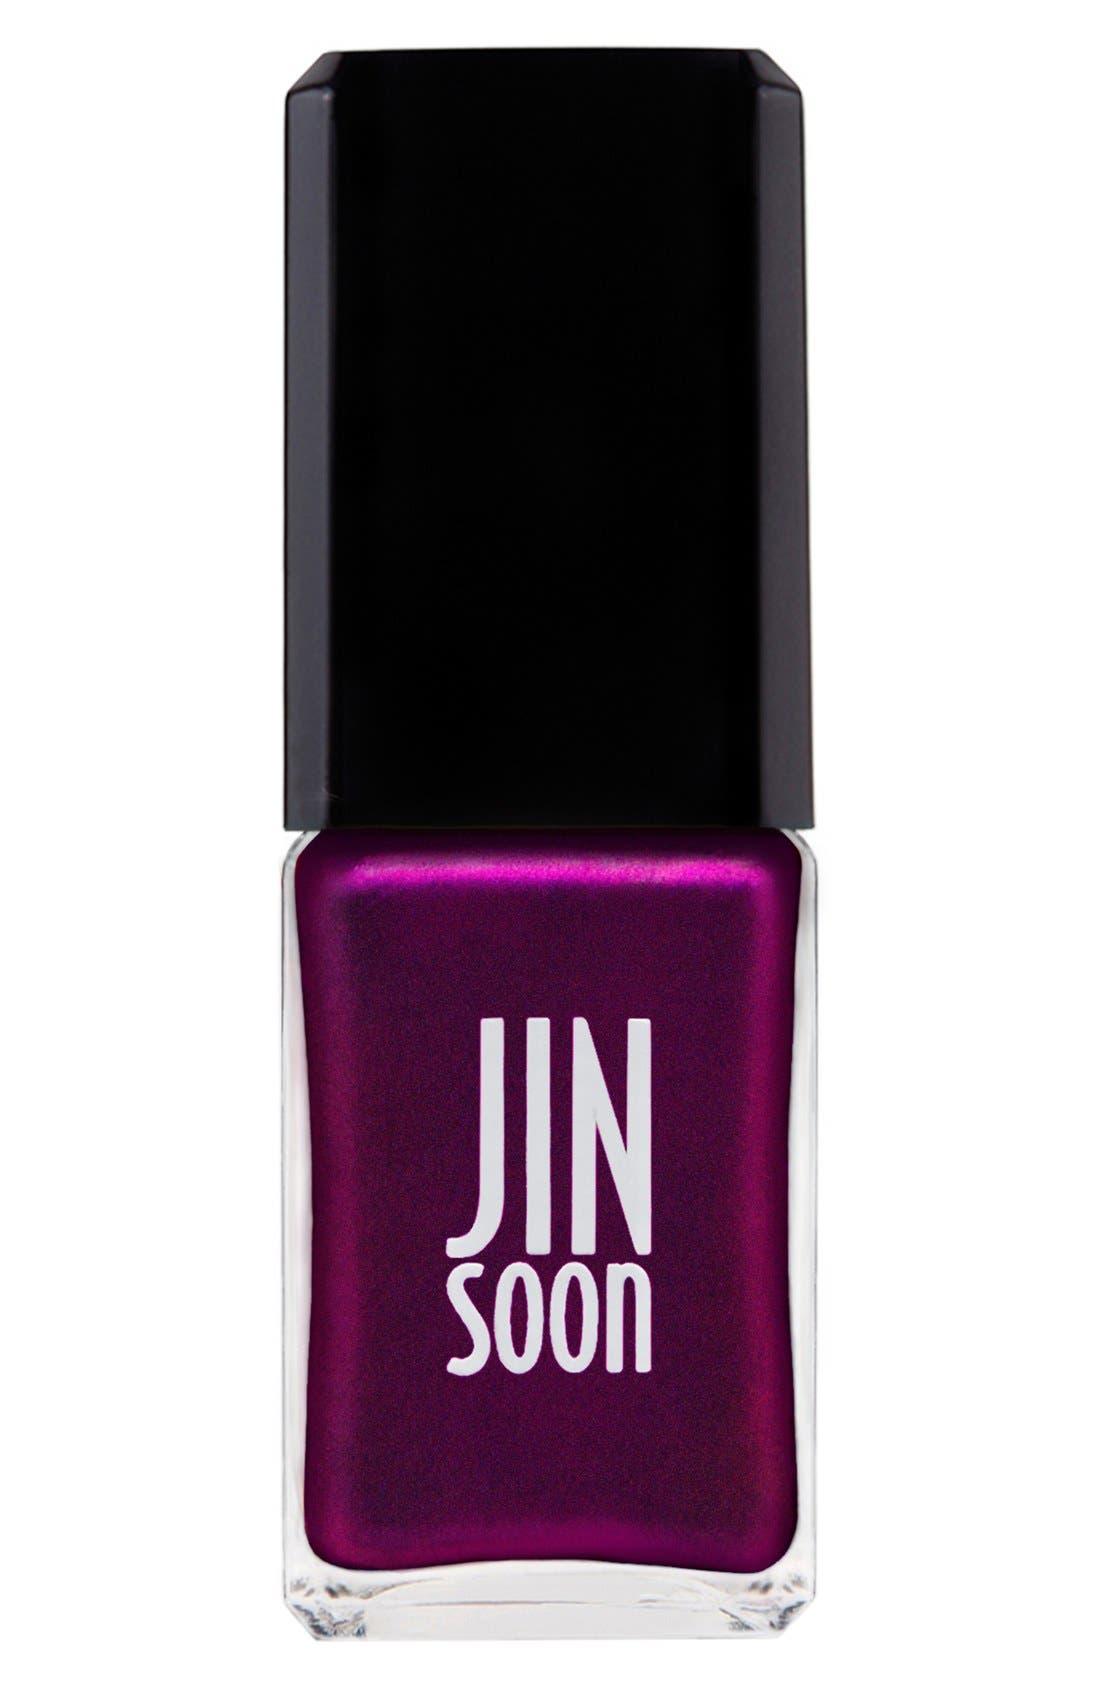 JINsoon 'Soubrette' Nail Lacquer